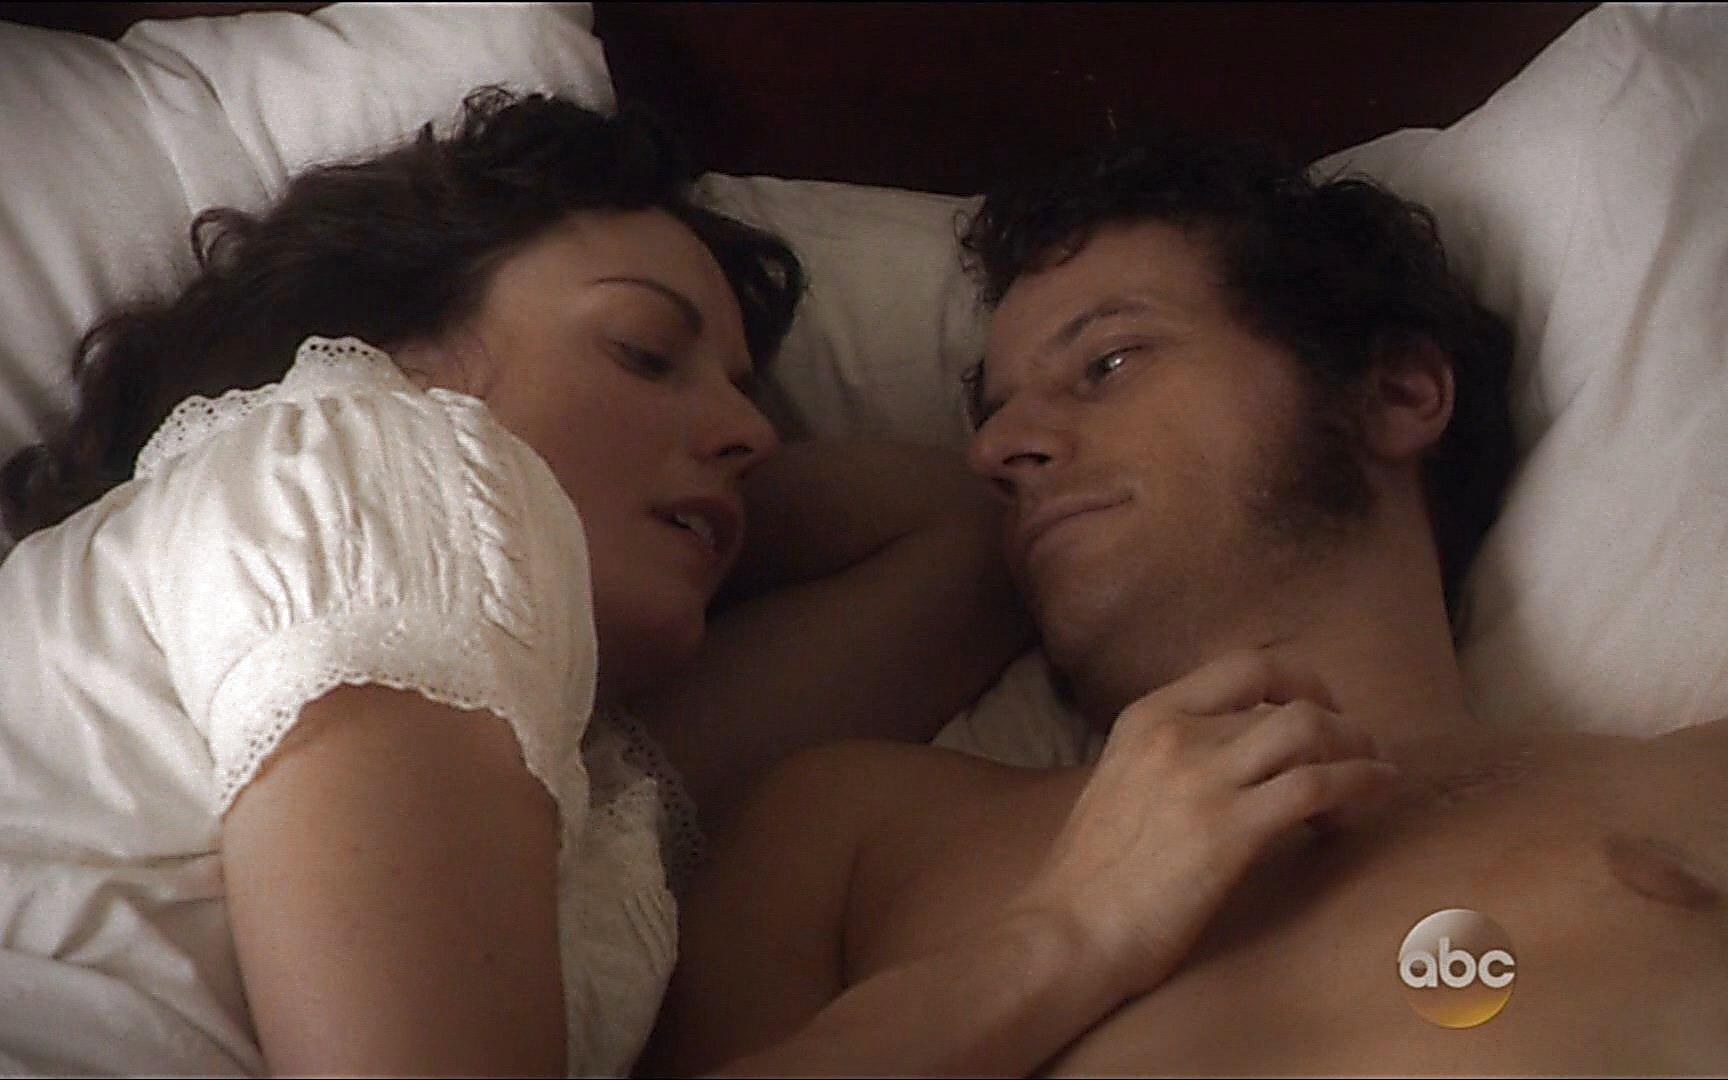 Ioan Gruffudd sexy shirtless scene January 3, 2015, 12am